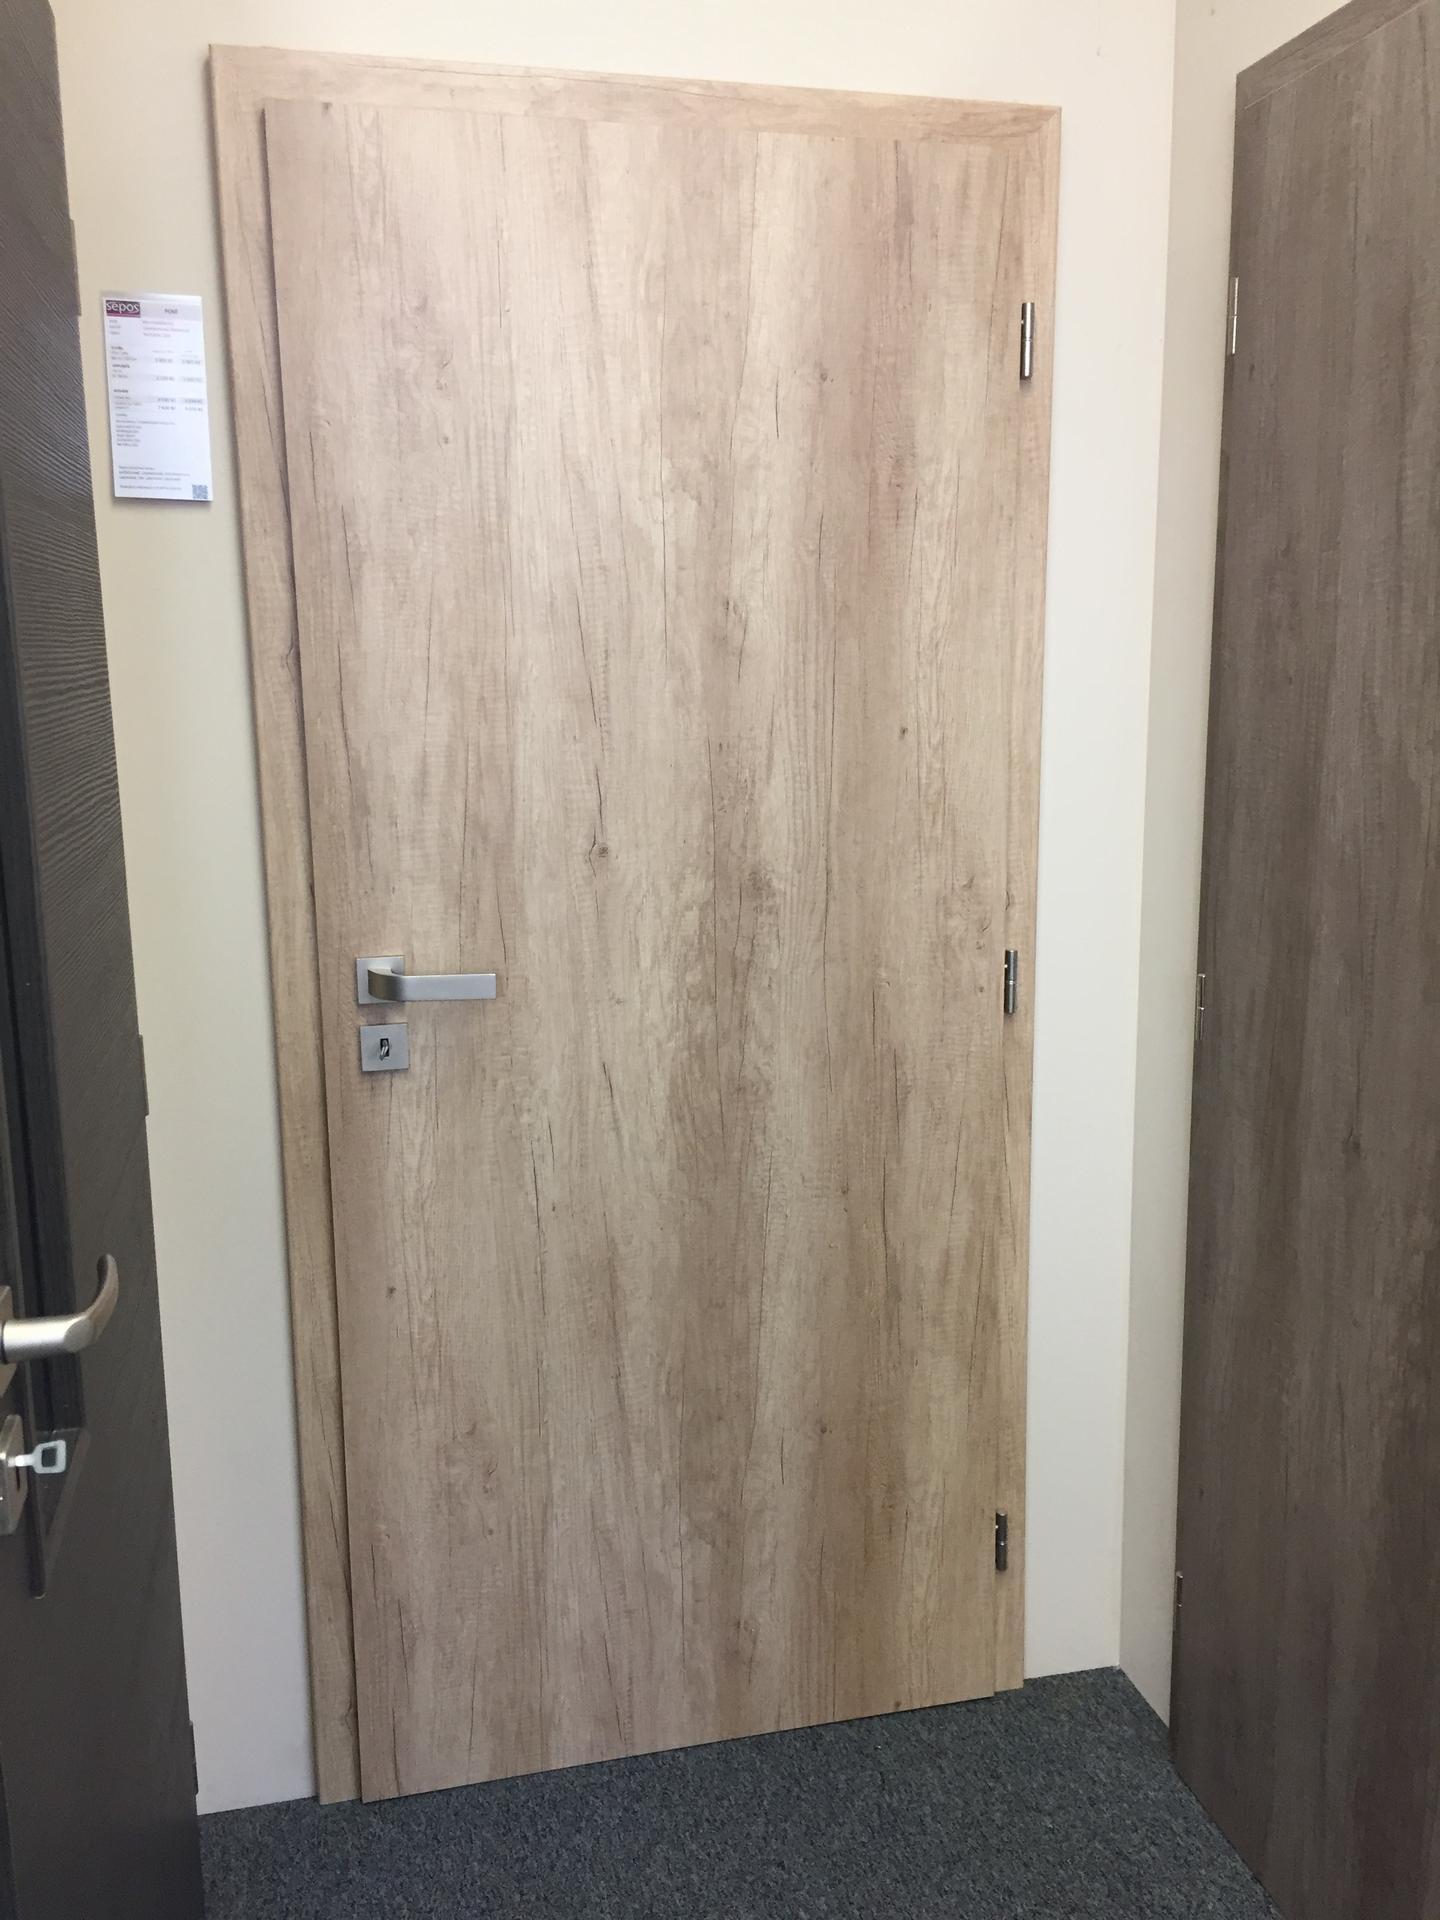 Co vyberem za dvere? - SEPOS lamino PRemium - natural